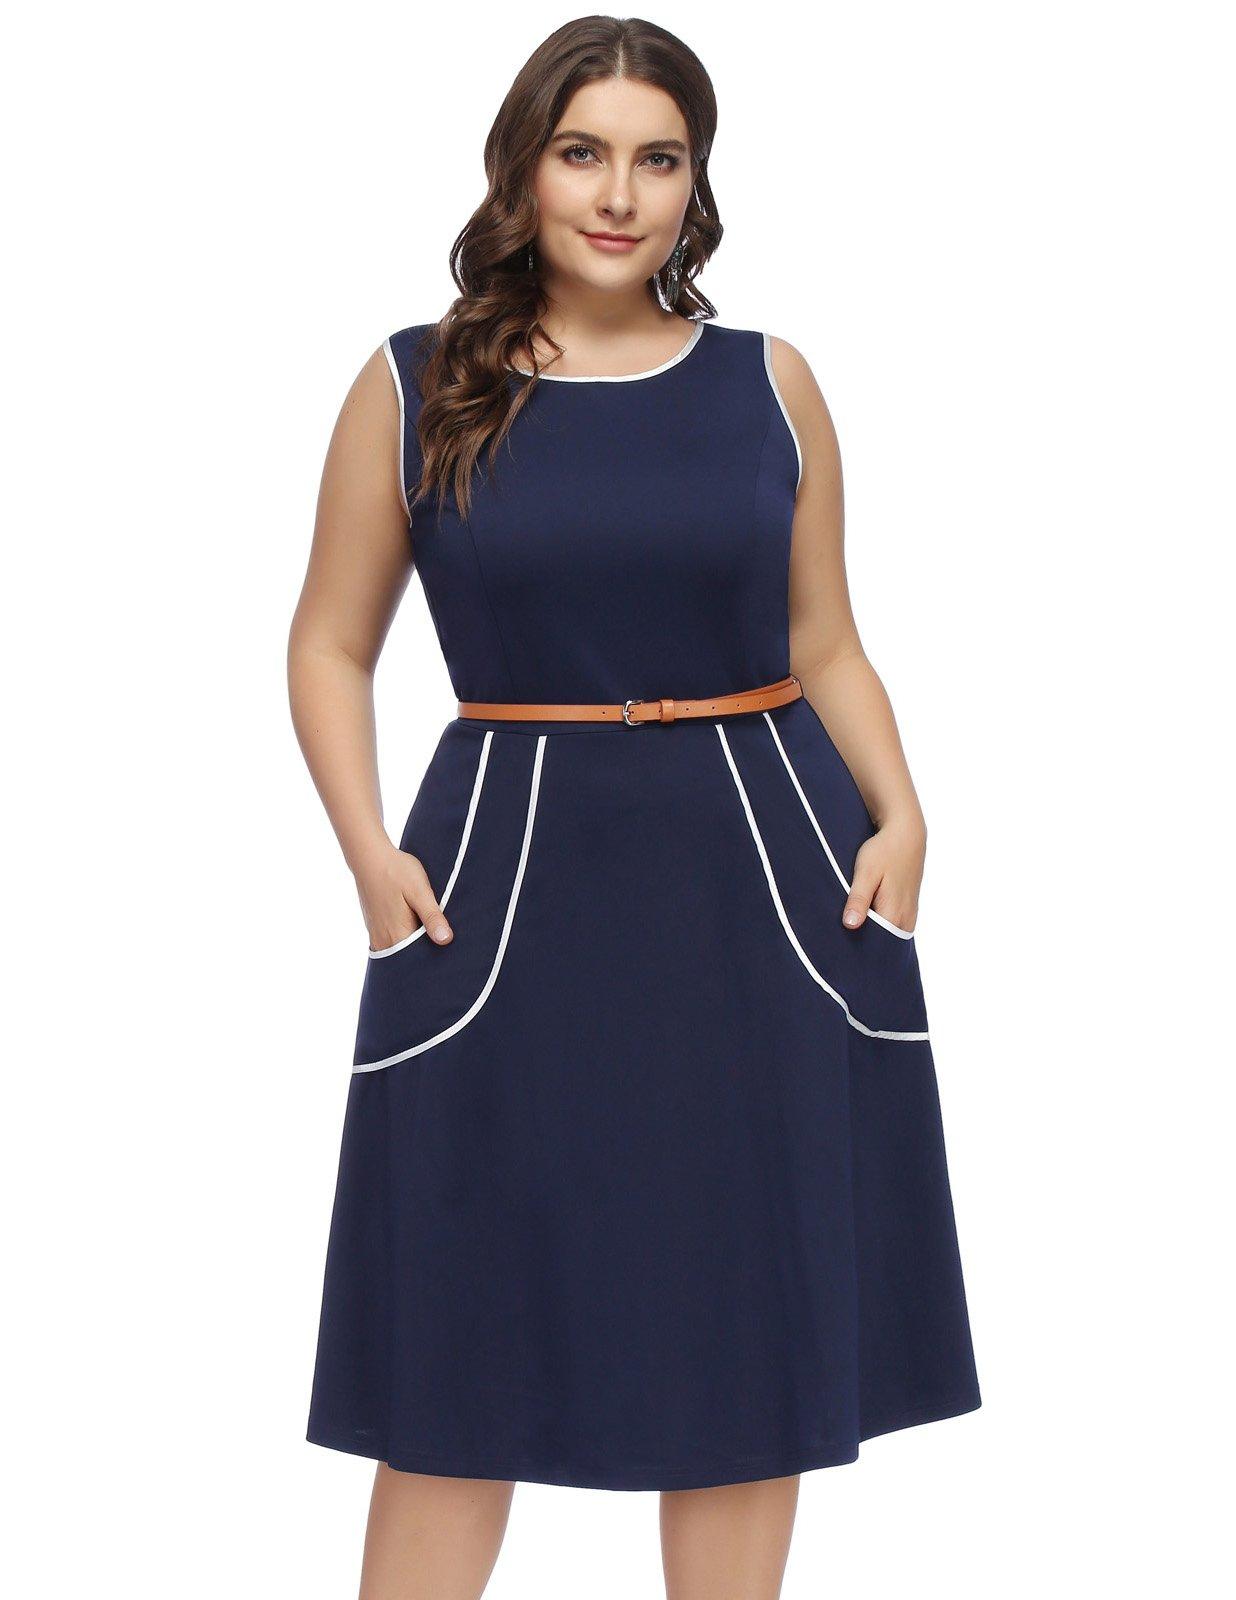 Women Sleeveless Belted Business Flared A-Line Pockets Dress 22W Navy Blue